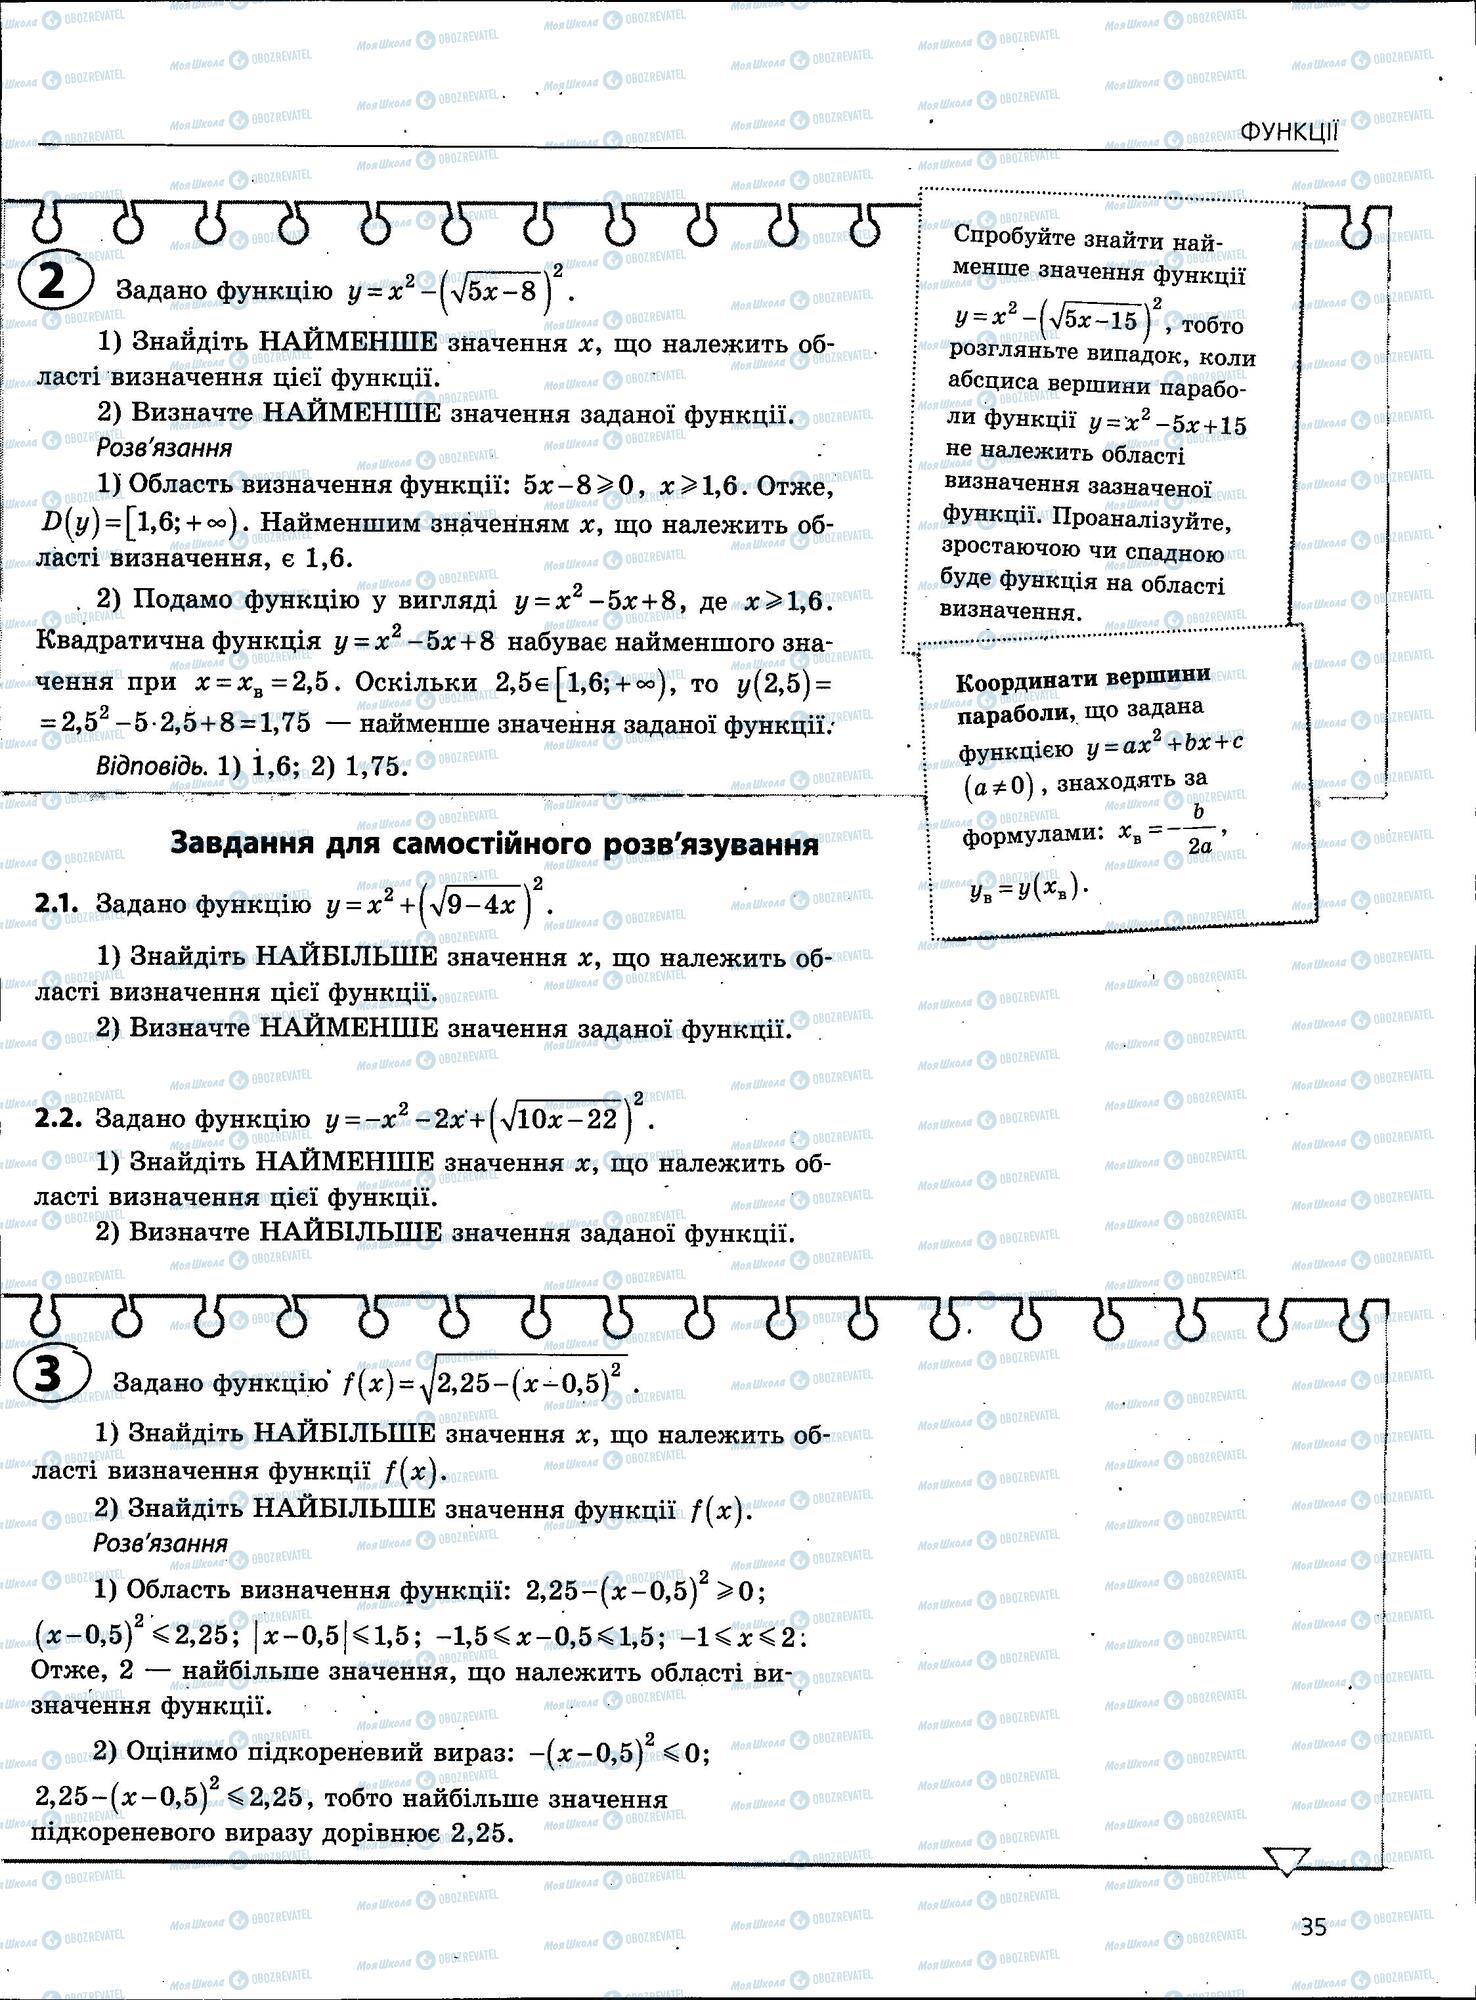 ЗНО Математика 11 класс страница 35